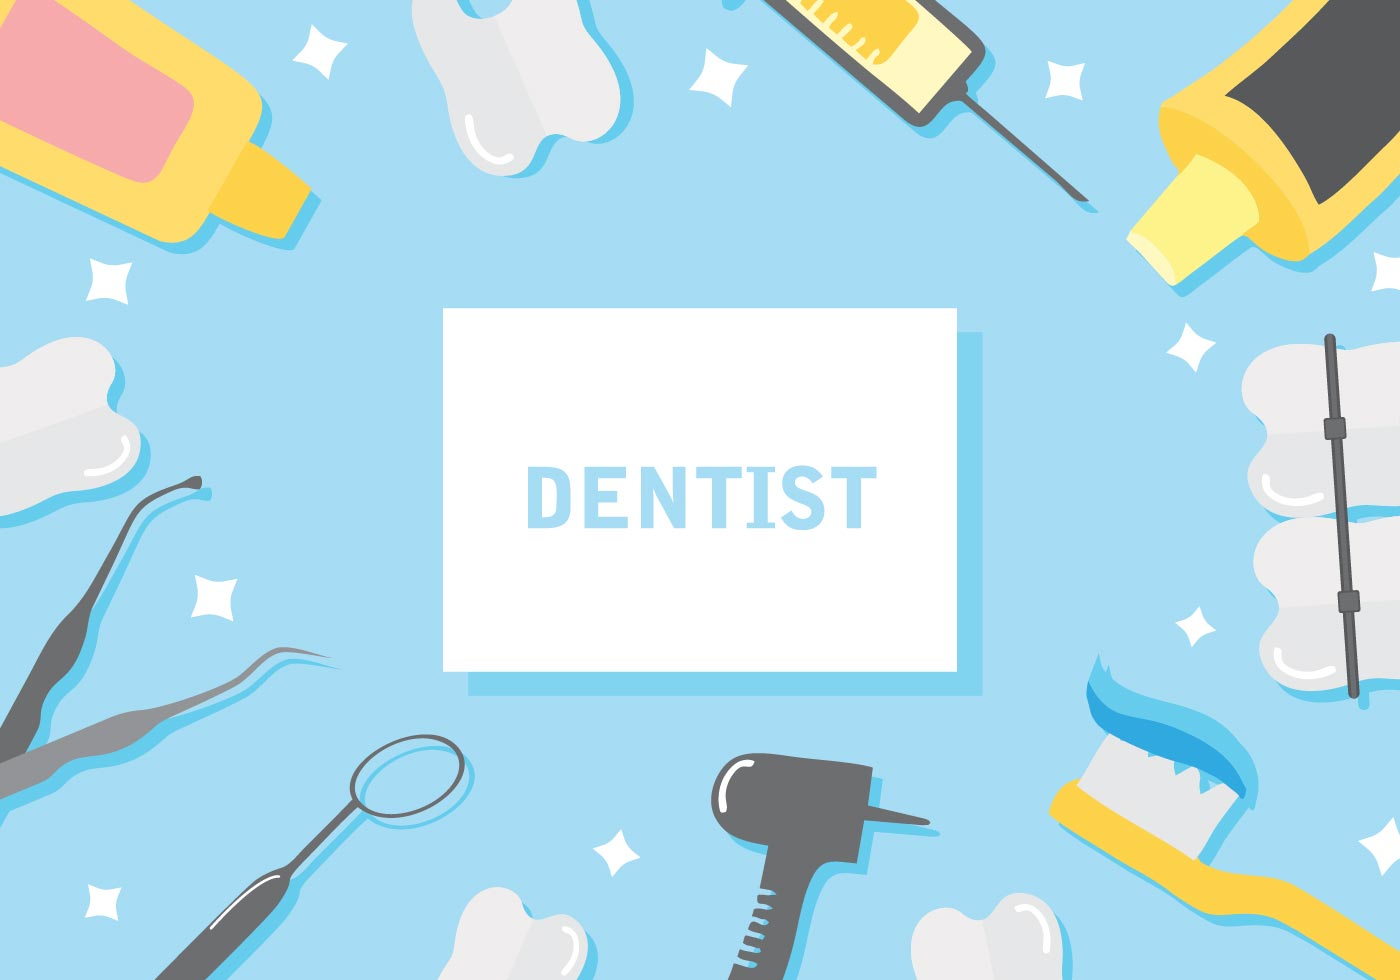 Dentist Background Vector Illustration 136994 Vector Art at 1400x980